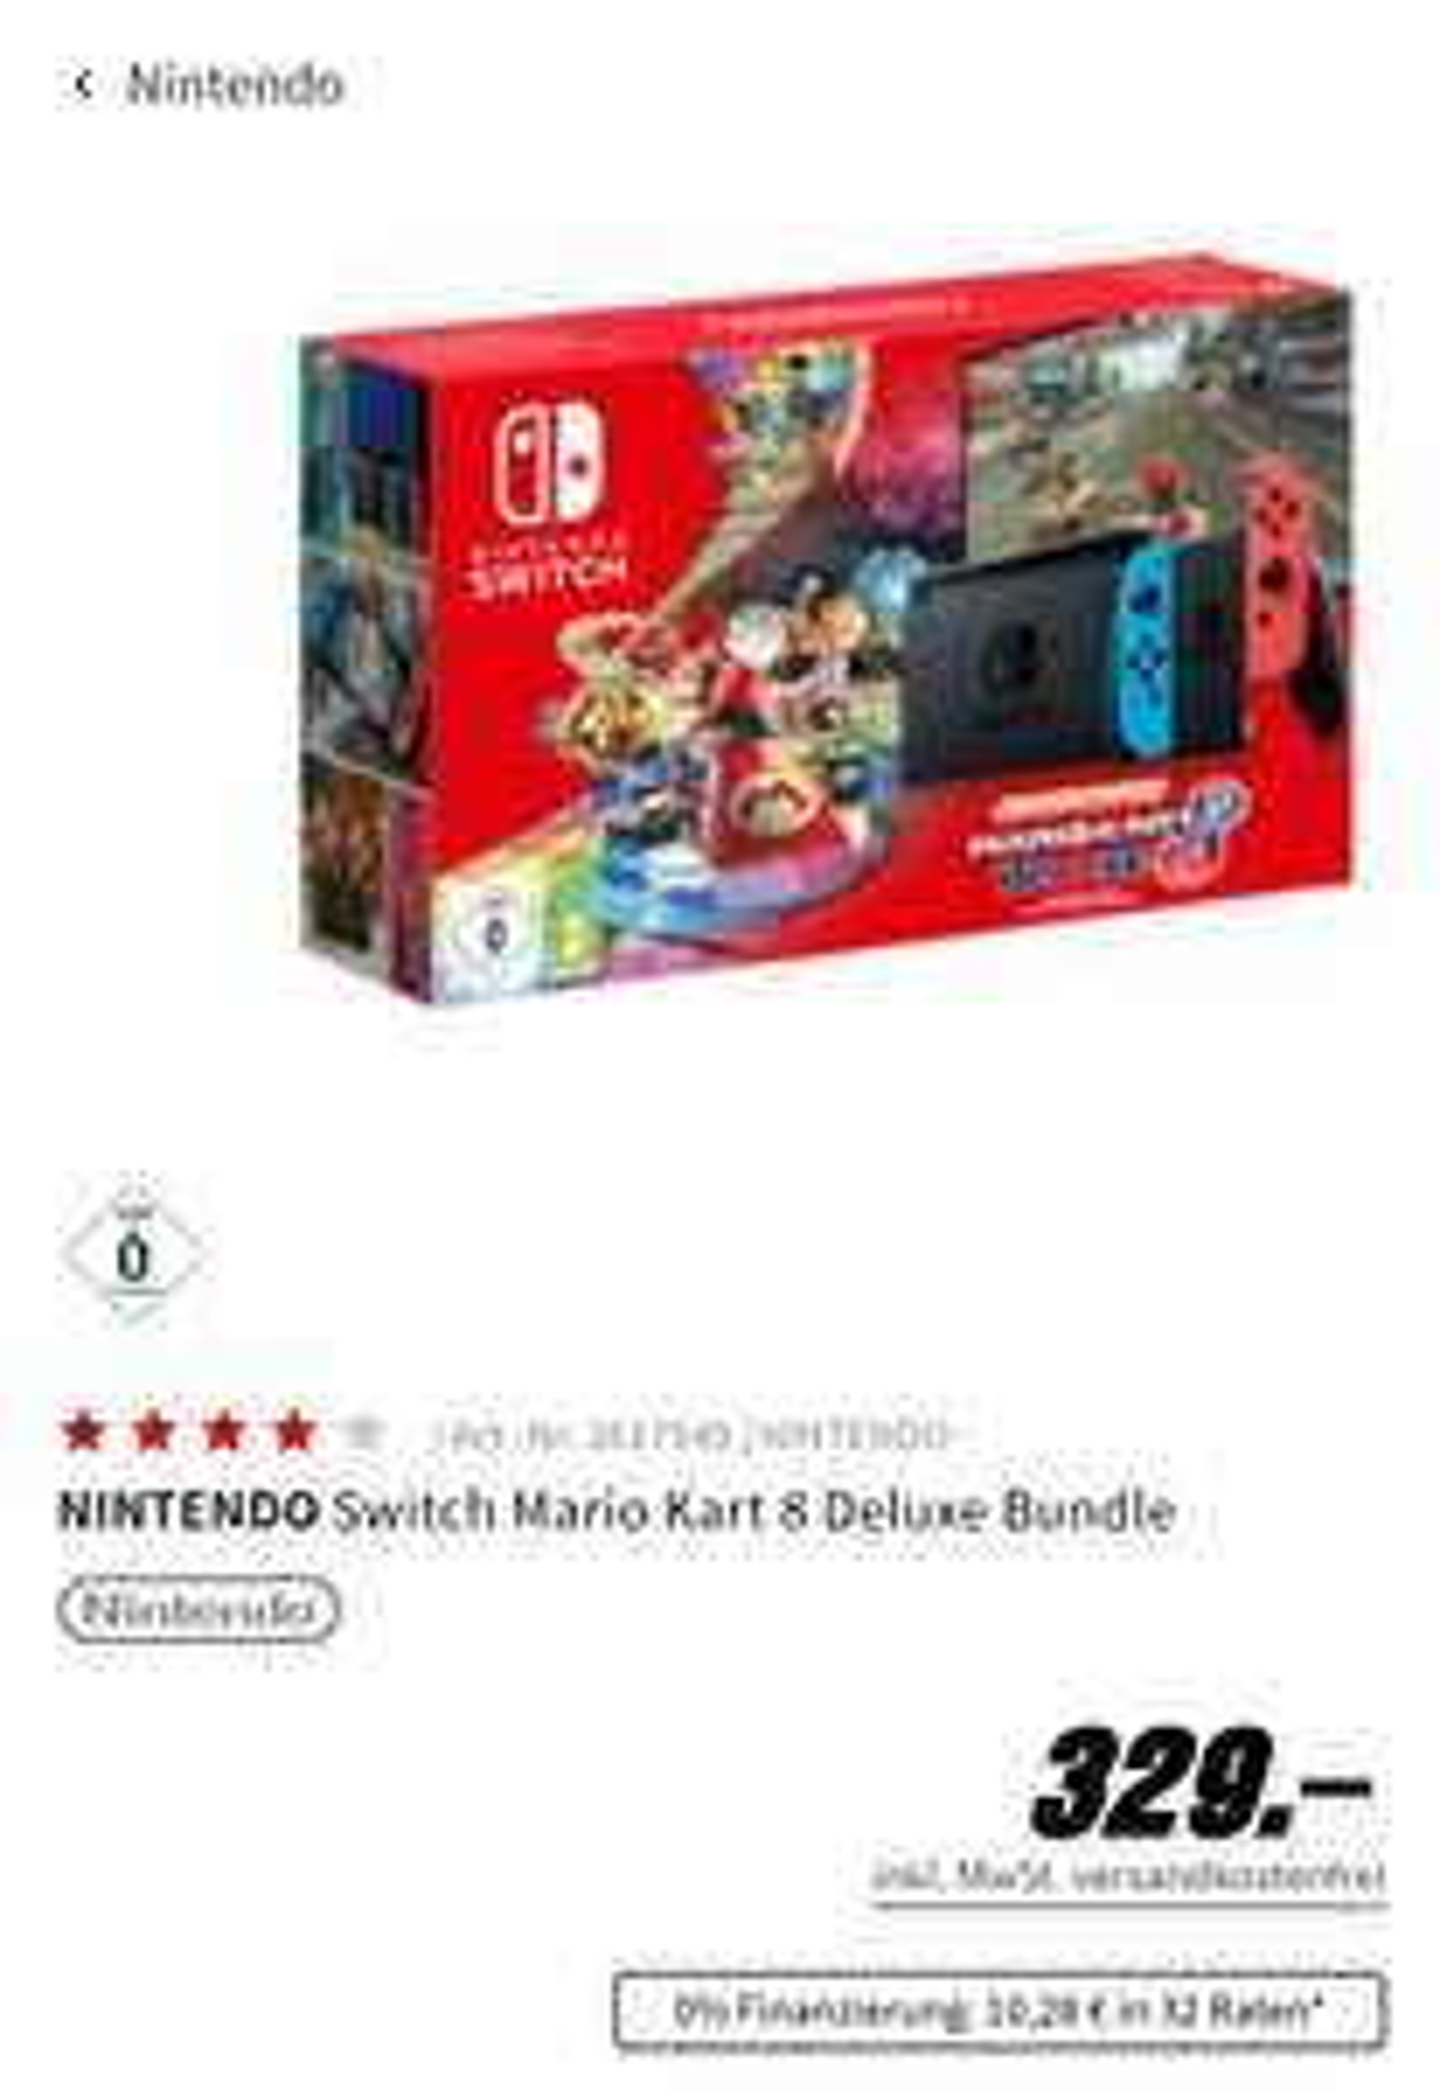 NINTENDOSwitch Mario Kart 8 Deluxe Bundle